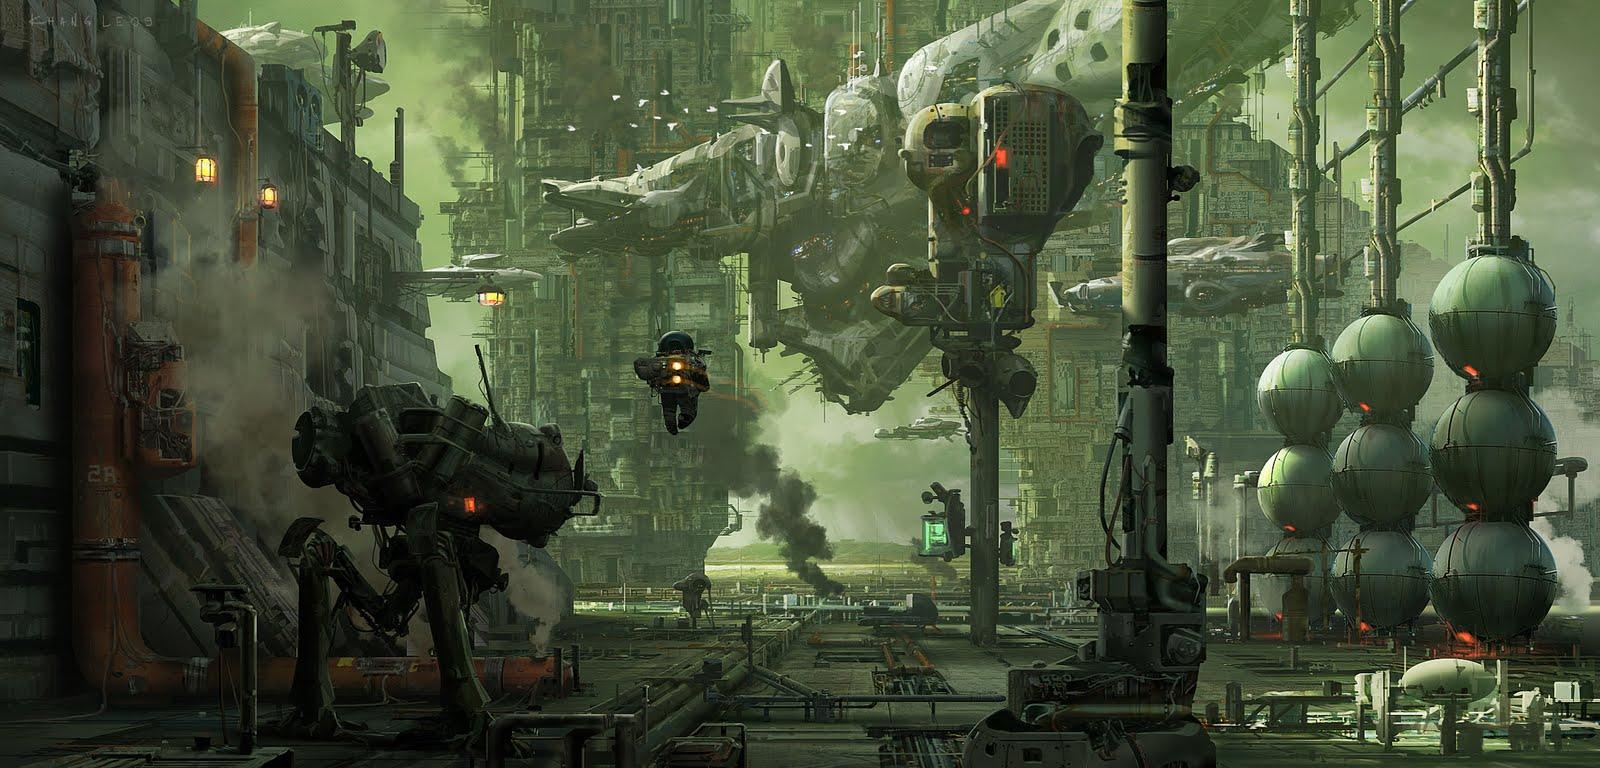 Concept design academy sci fi mech design with khang le for Sci fi decor